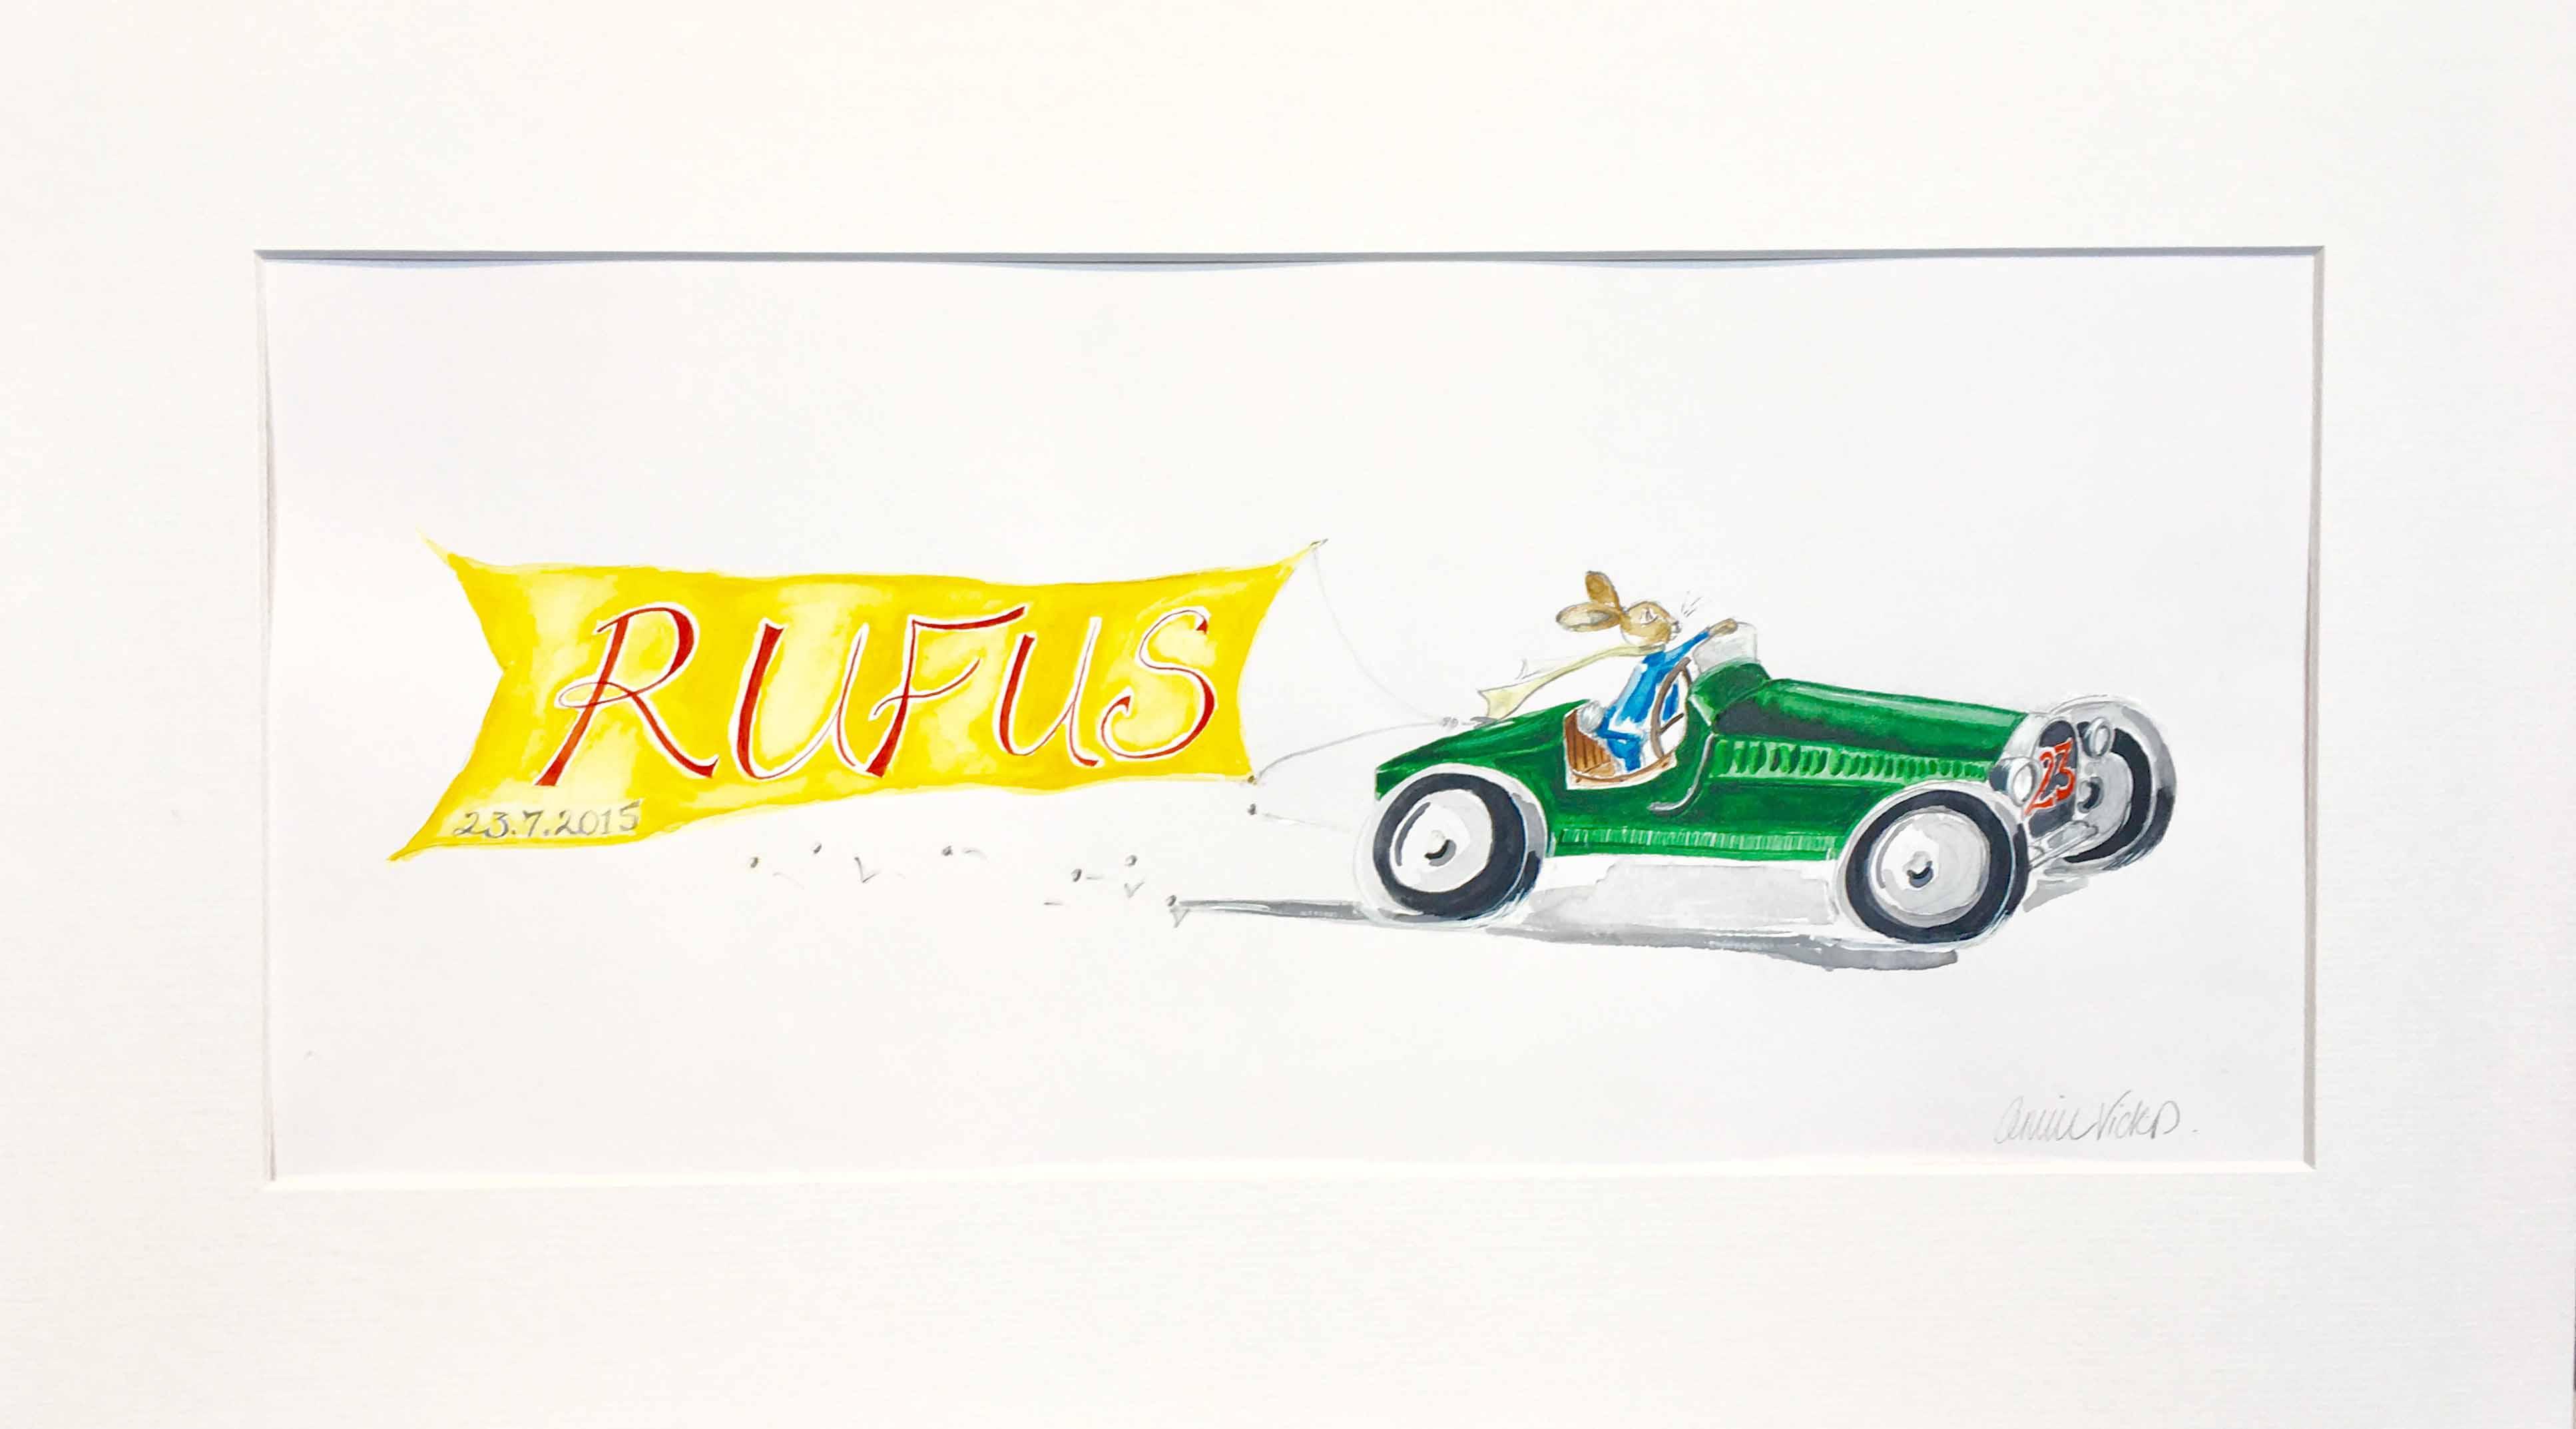 Rufus the Racing Rabbit!